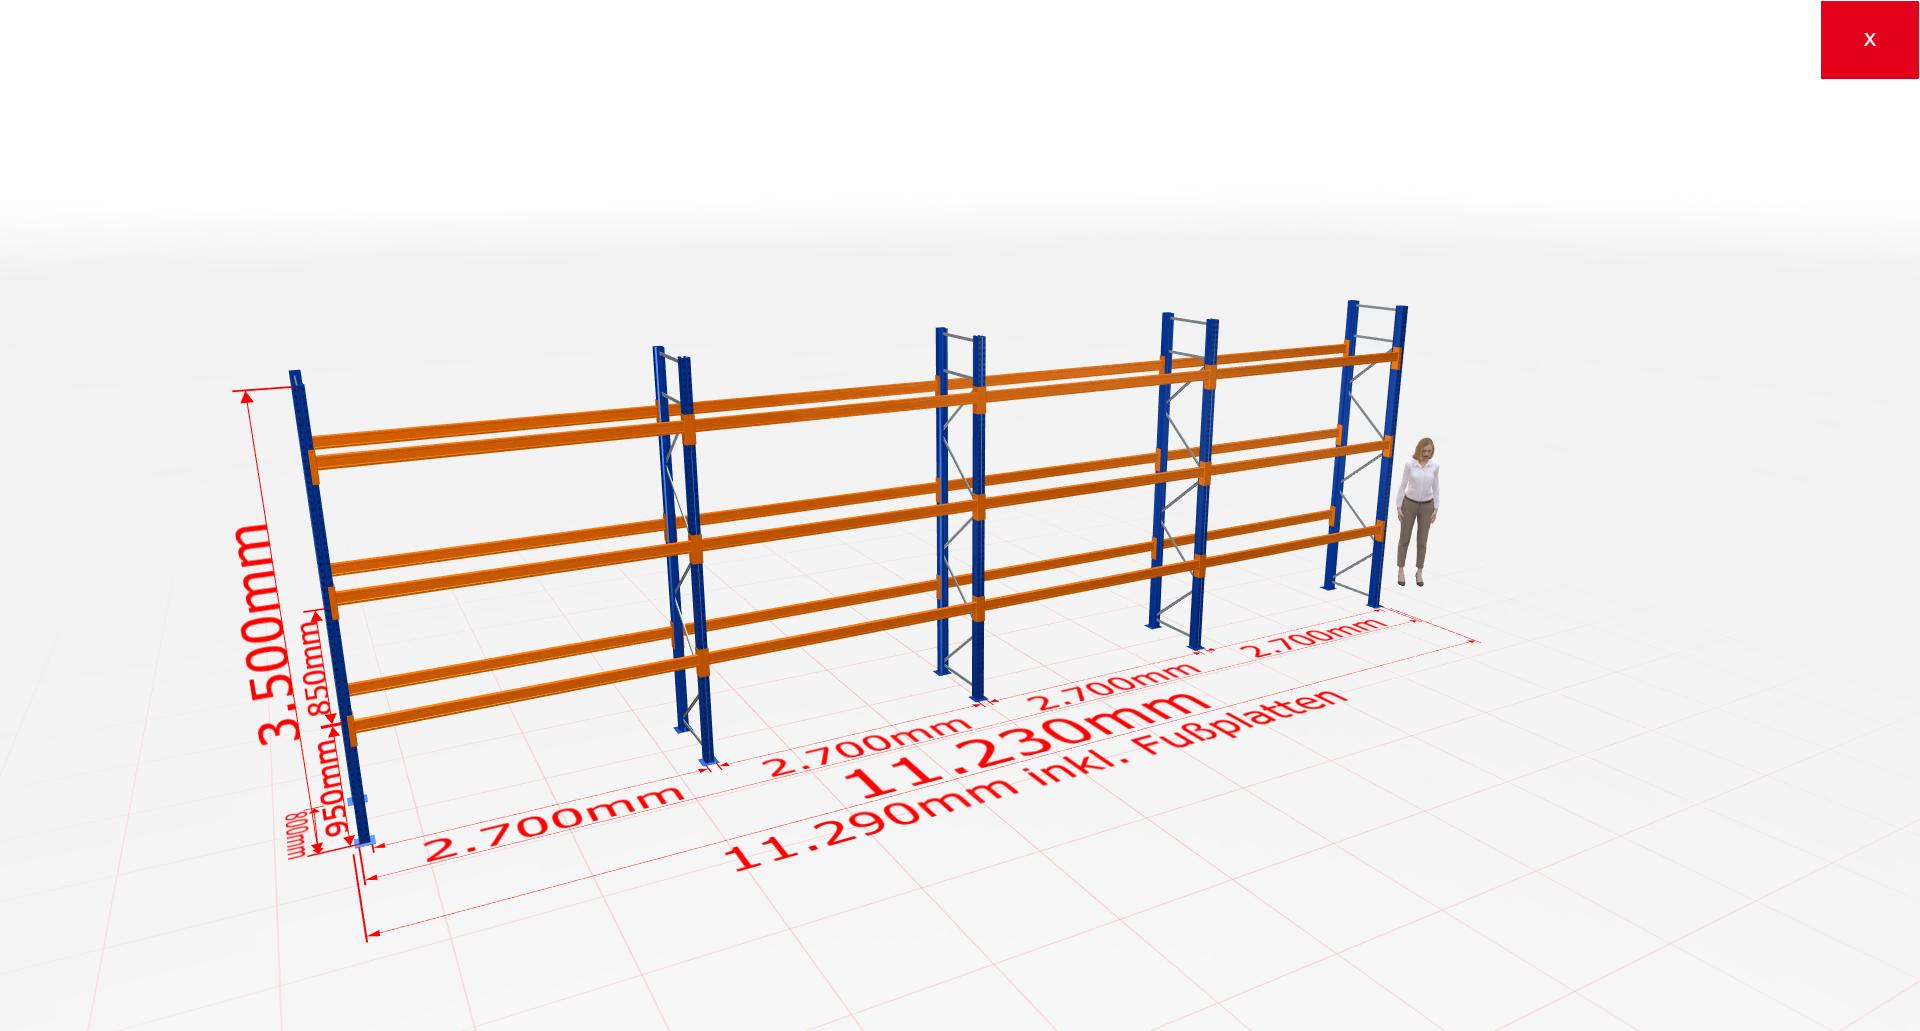 Palettenregal Komplettregal 3500x11230x800 mm (HxBxT) 3 Fachebenen SCHULTE Lagertechnik